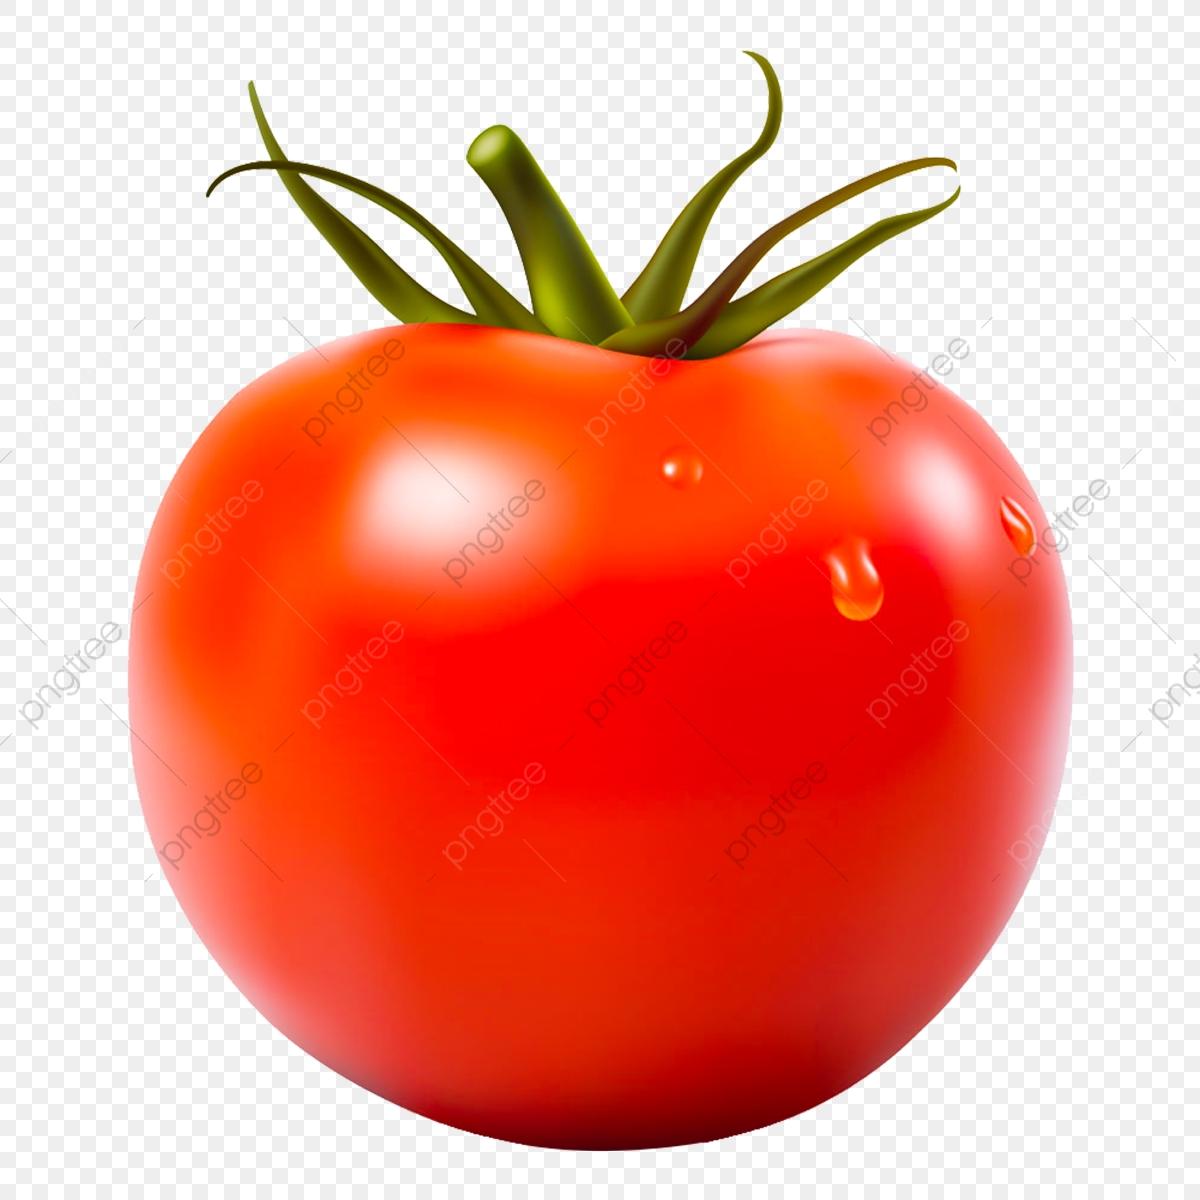 Tomato, Sauce, Tomato Sauce PNG Transparent Clipart Image.